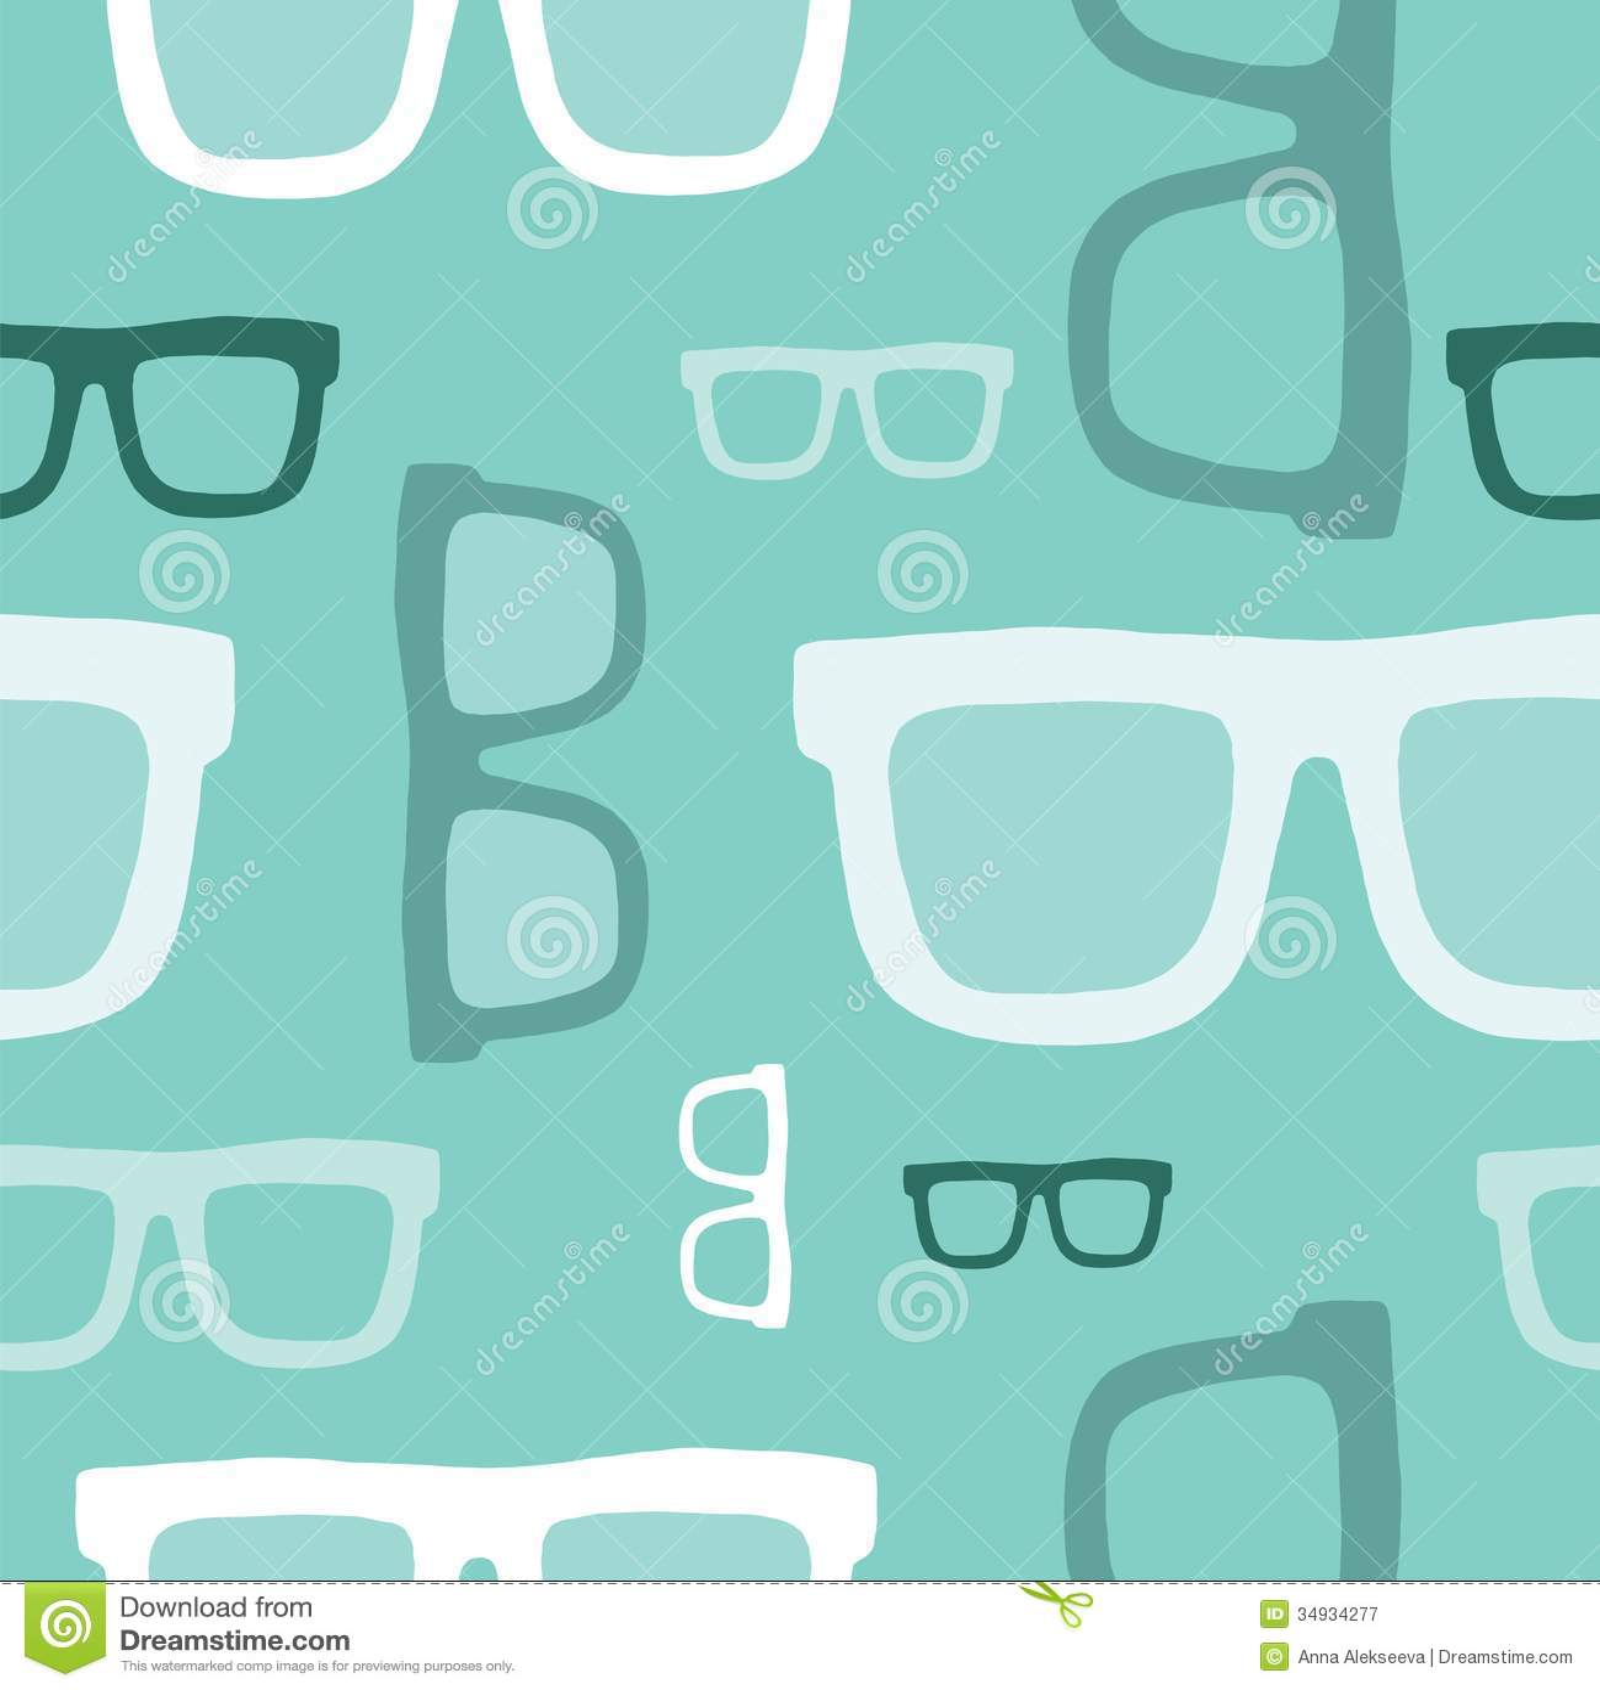 Hipster Glasses Seamless Pattern Stock Vector Illustration Of